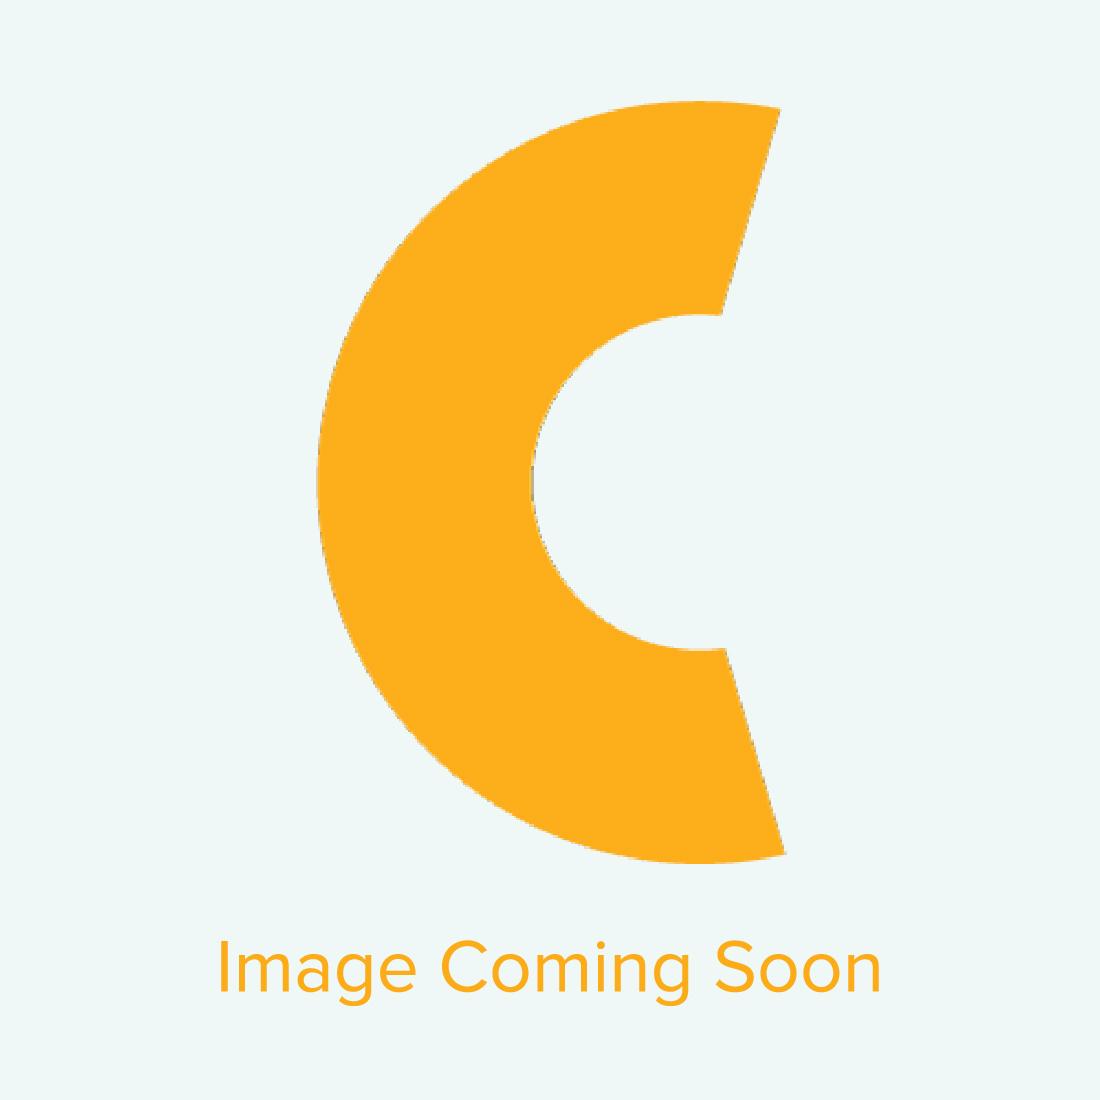 Graphtec CE6000-40 Vinyl Cutter Replacement Cutting Strip (2/pack)